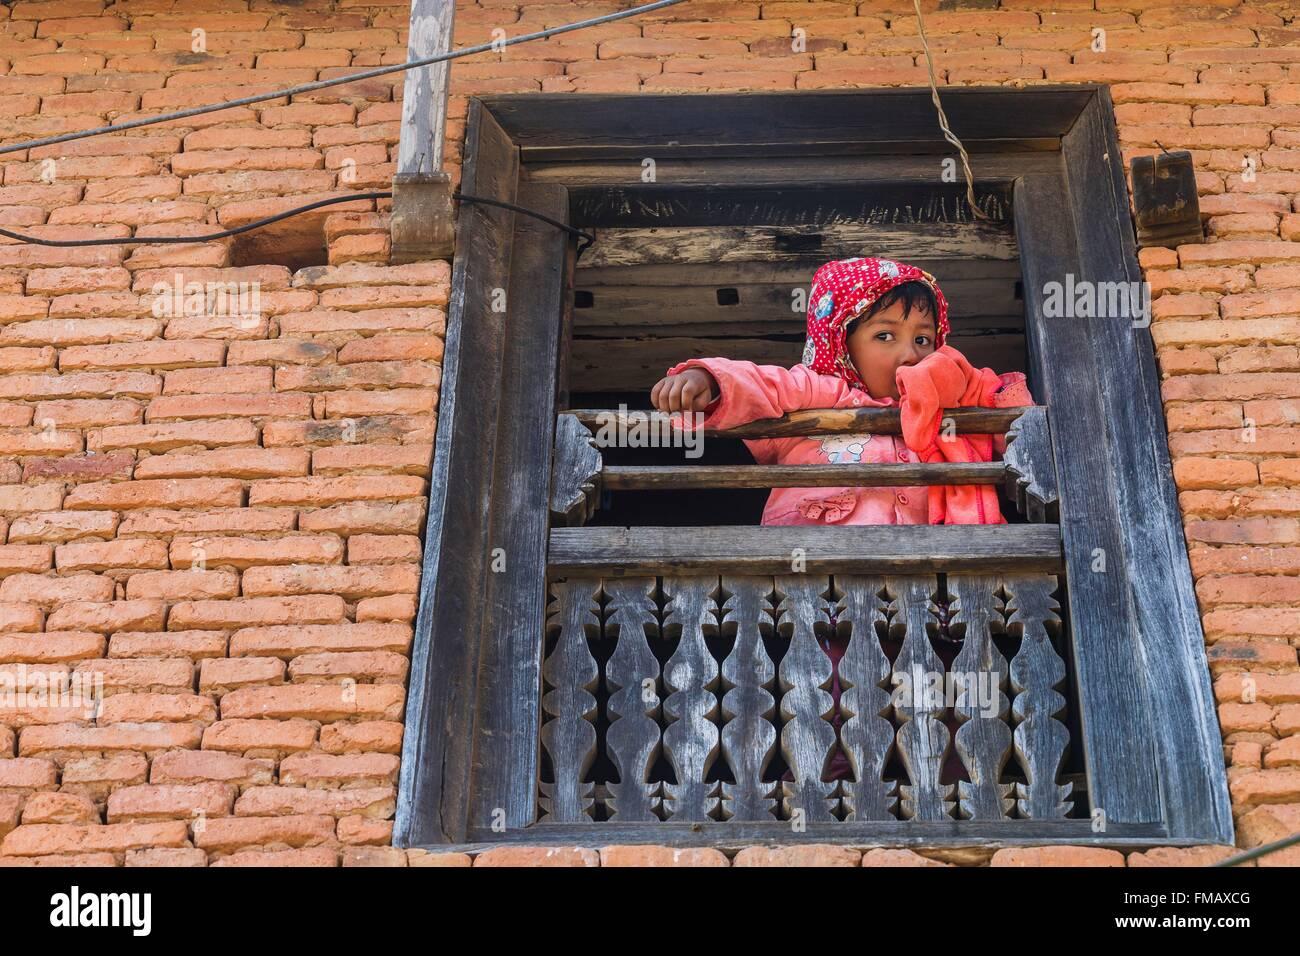 Nepal, Gandaki zone, Bandipur, a kid at the window - Stock Image